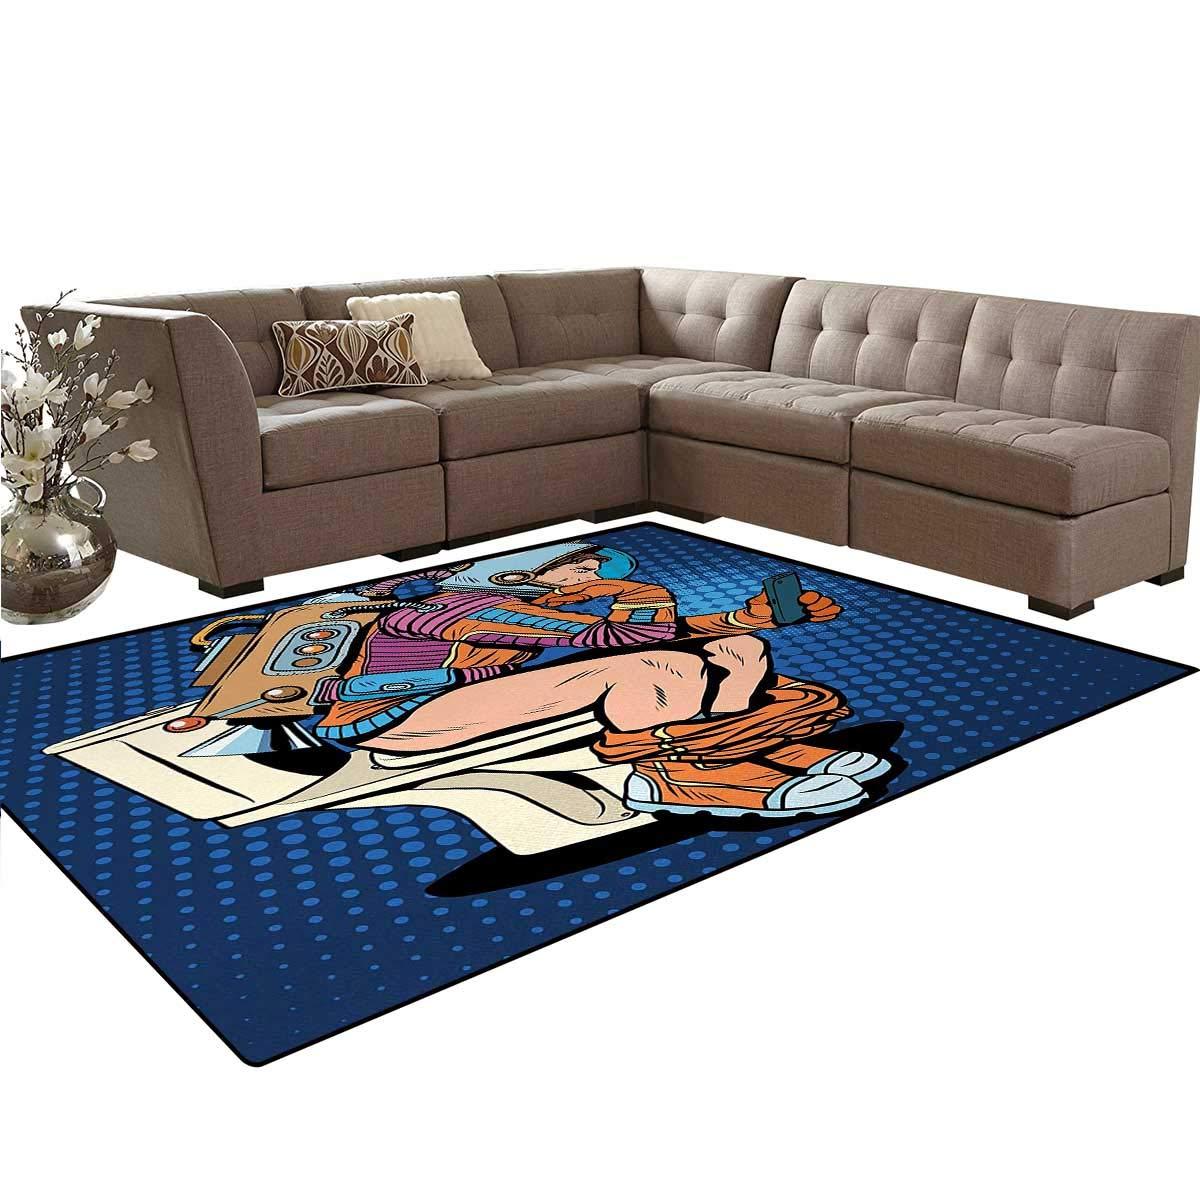 Amazon.com: Astronaut, Carpet, Futuristic Thinking Man with ...